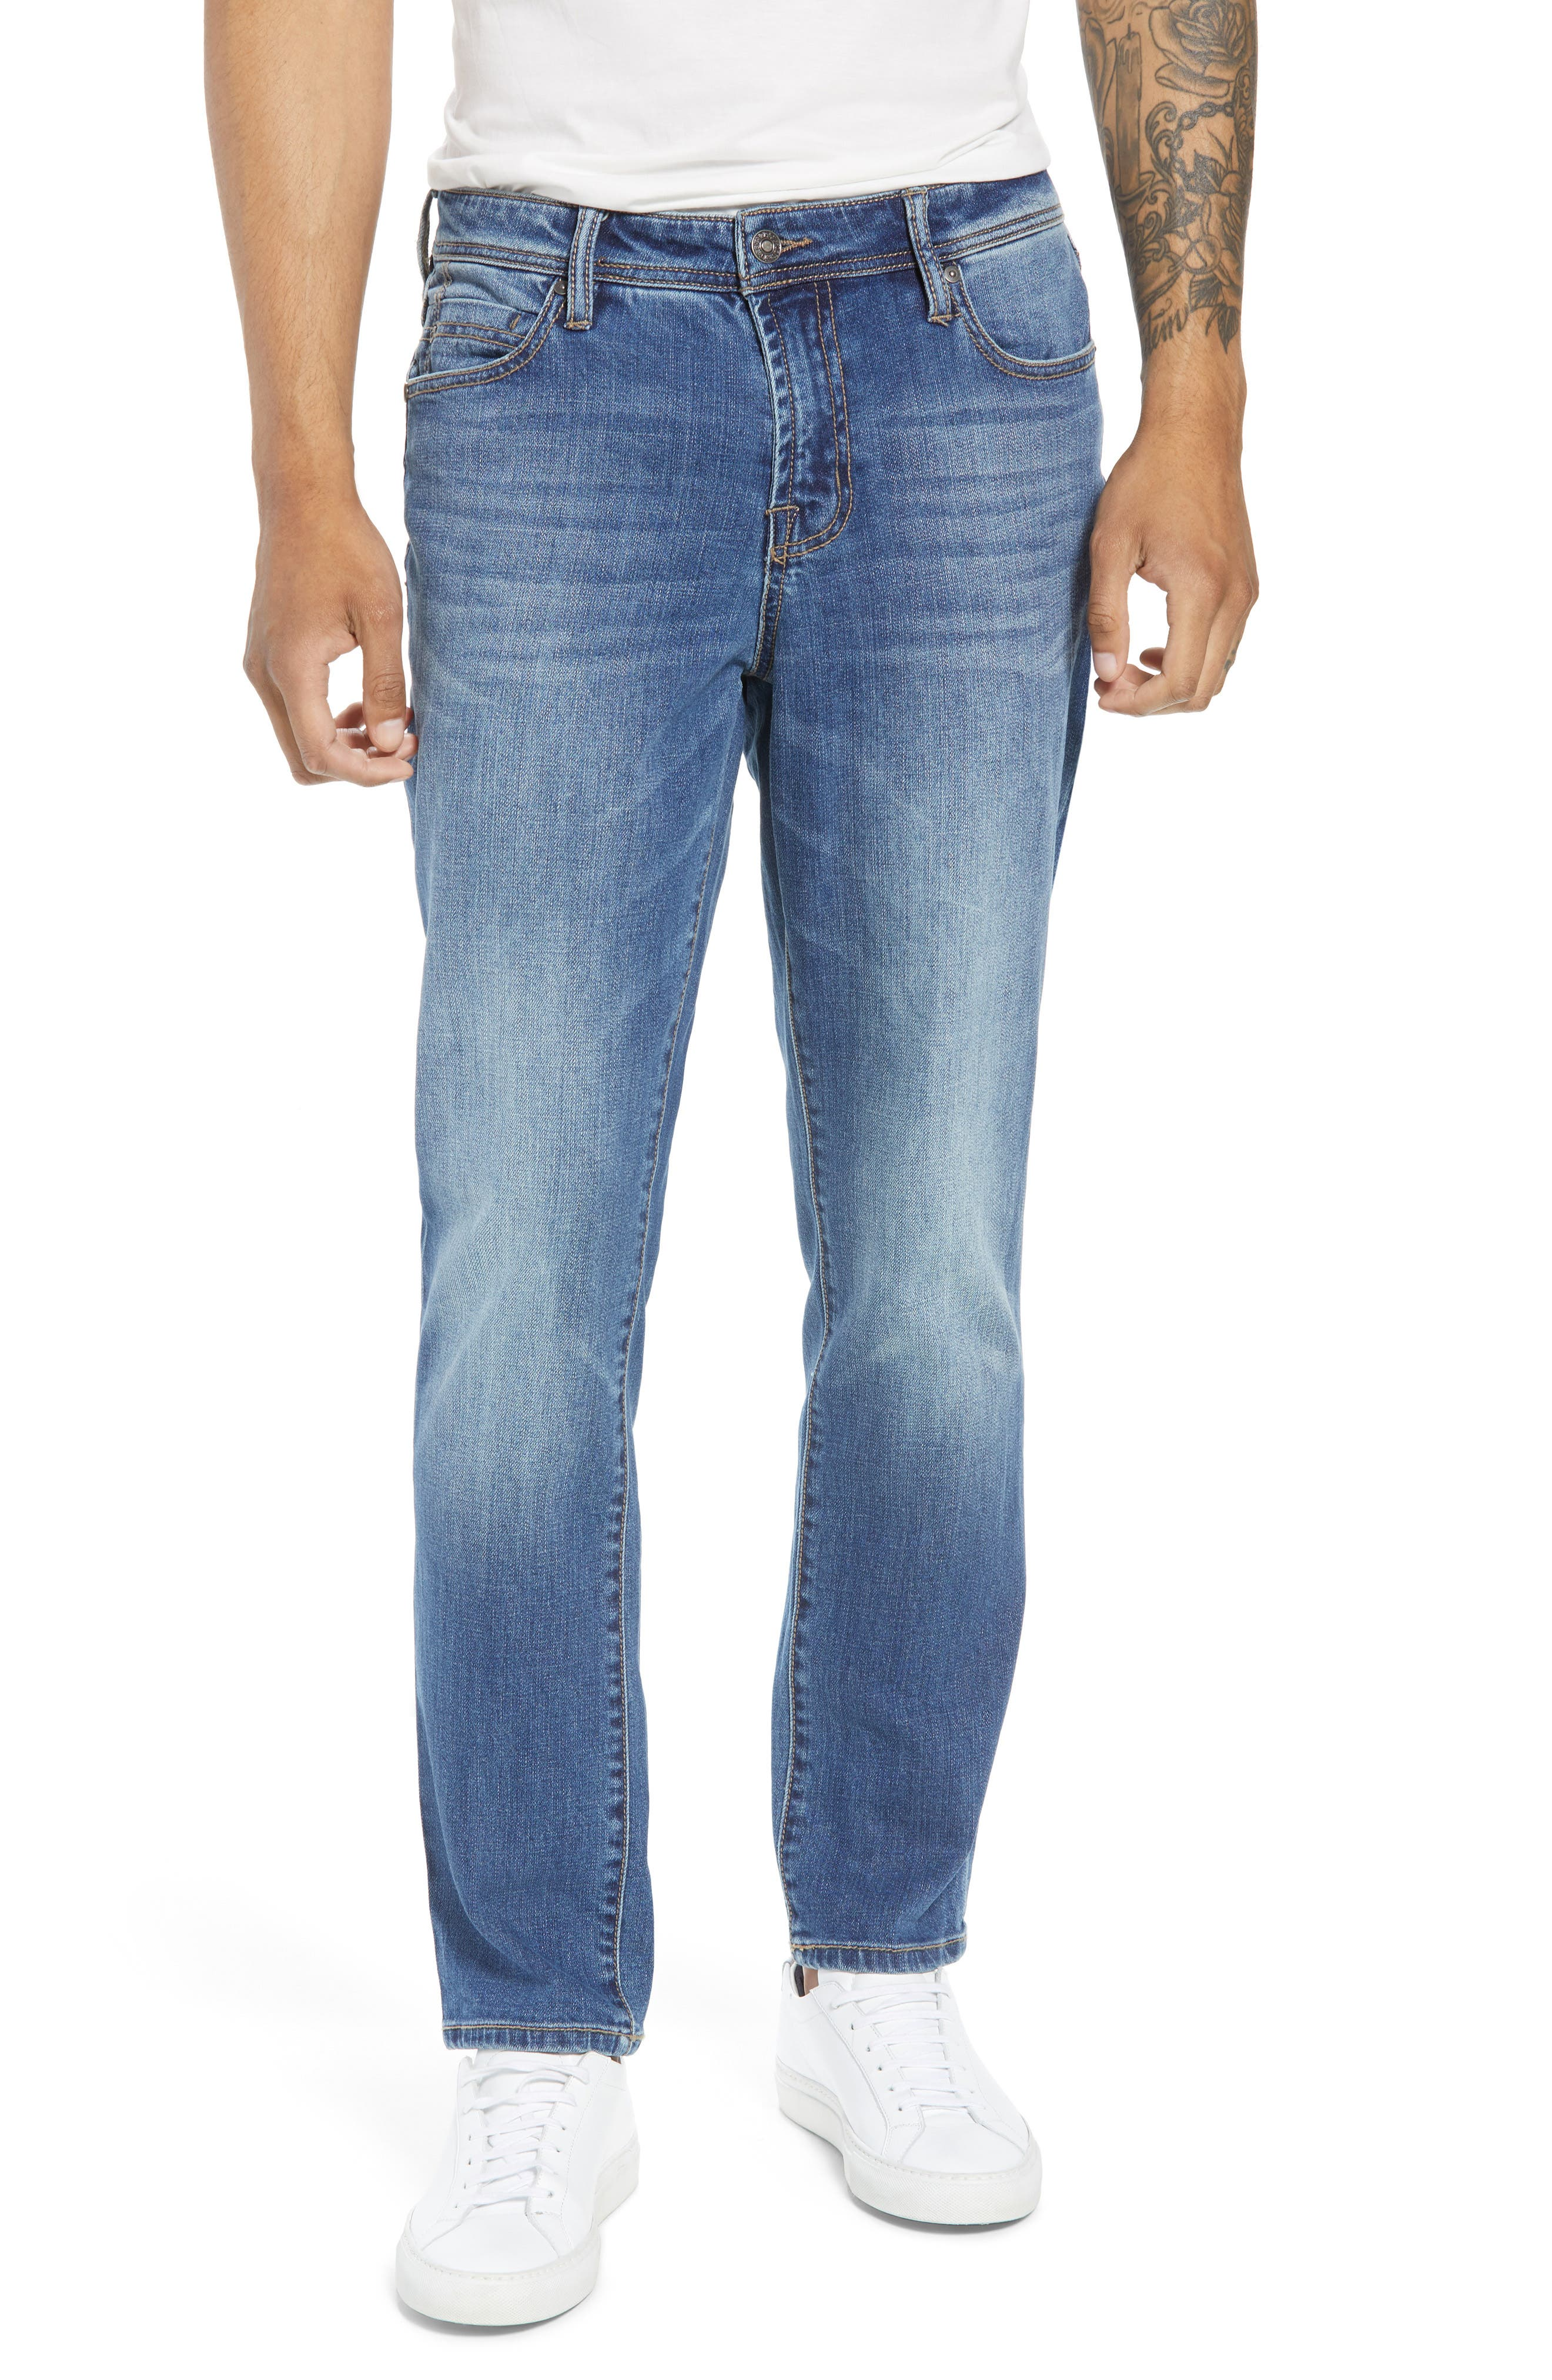 Jeans Co. Slim Straight Leg Jeans,                         Main,                         color, BRYSON VINTAGE MED